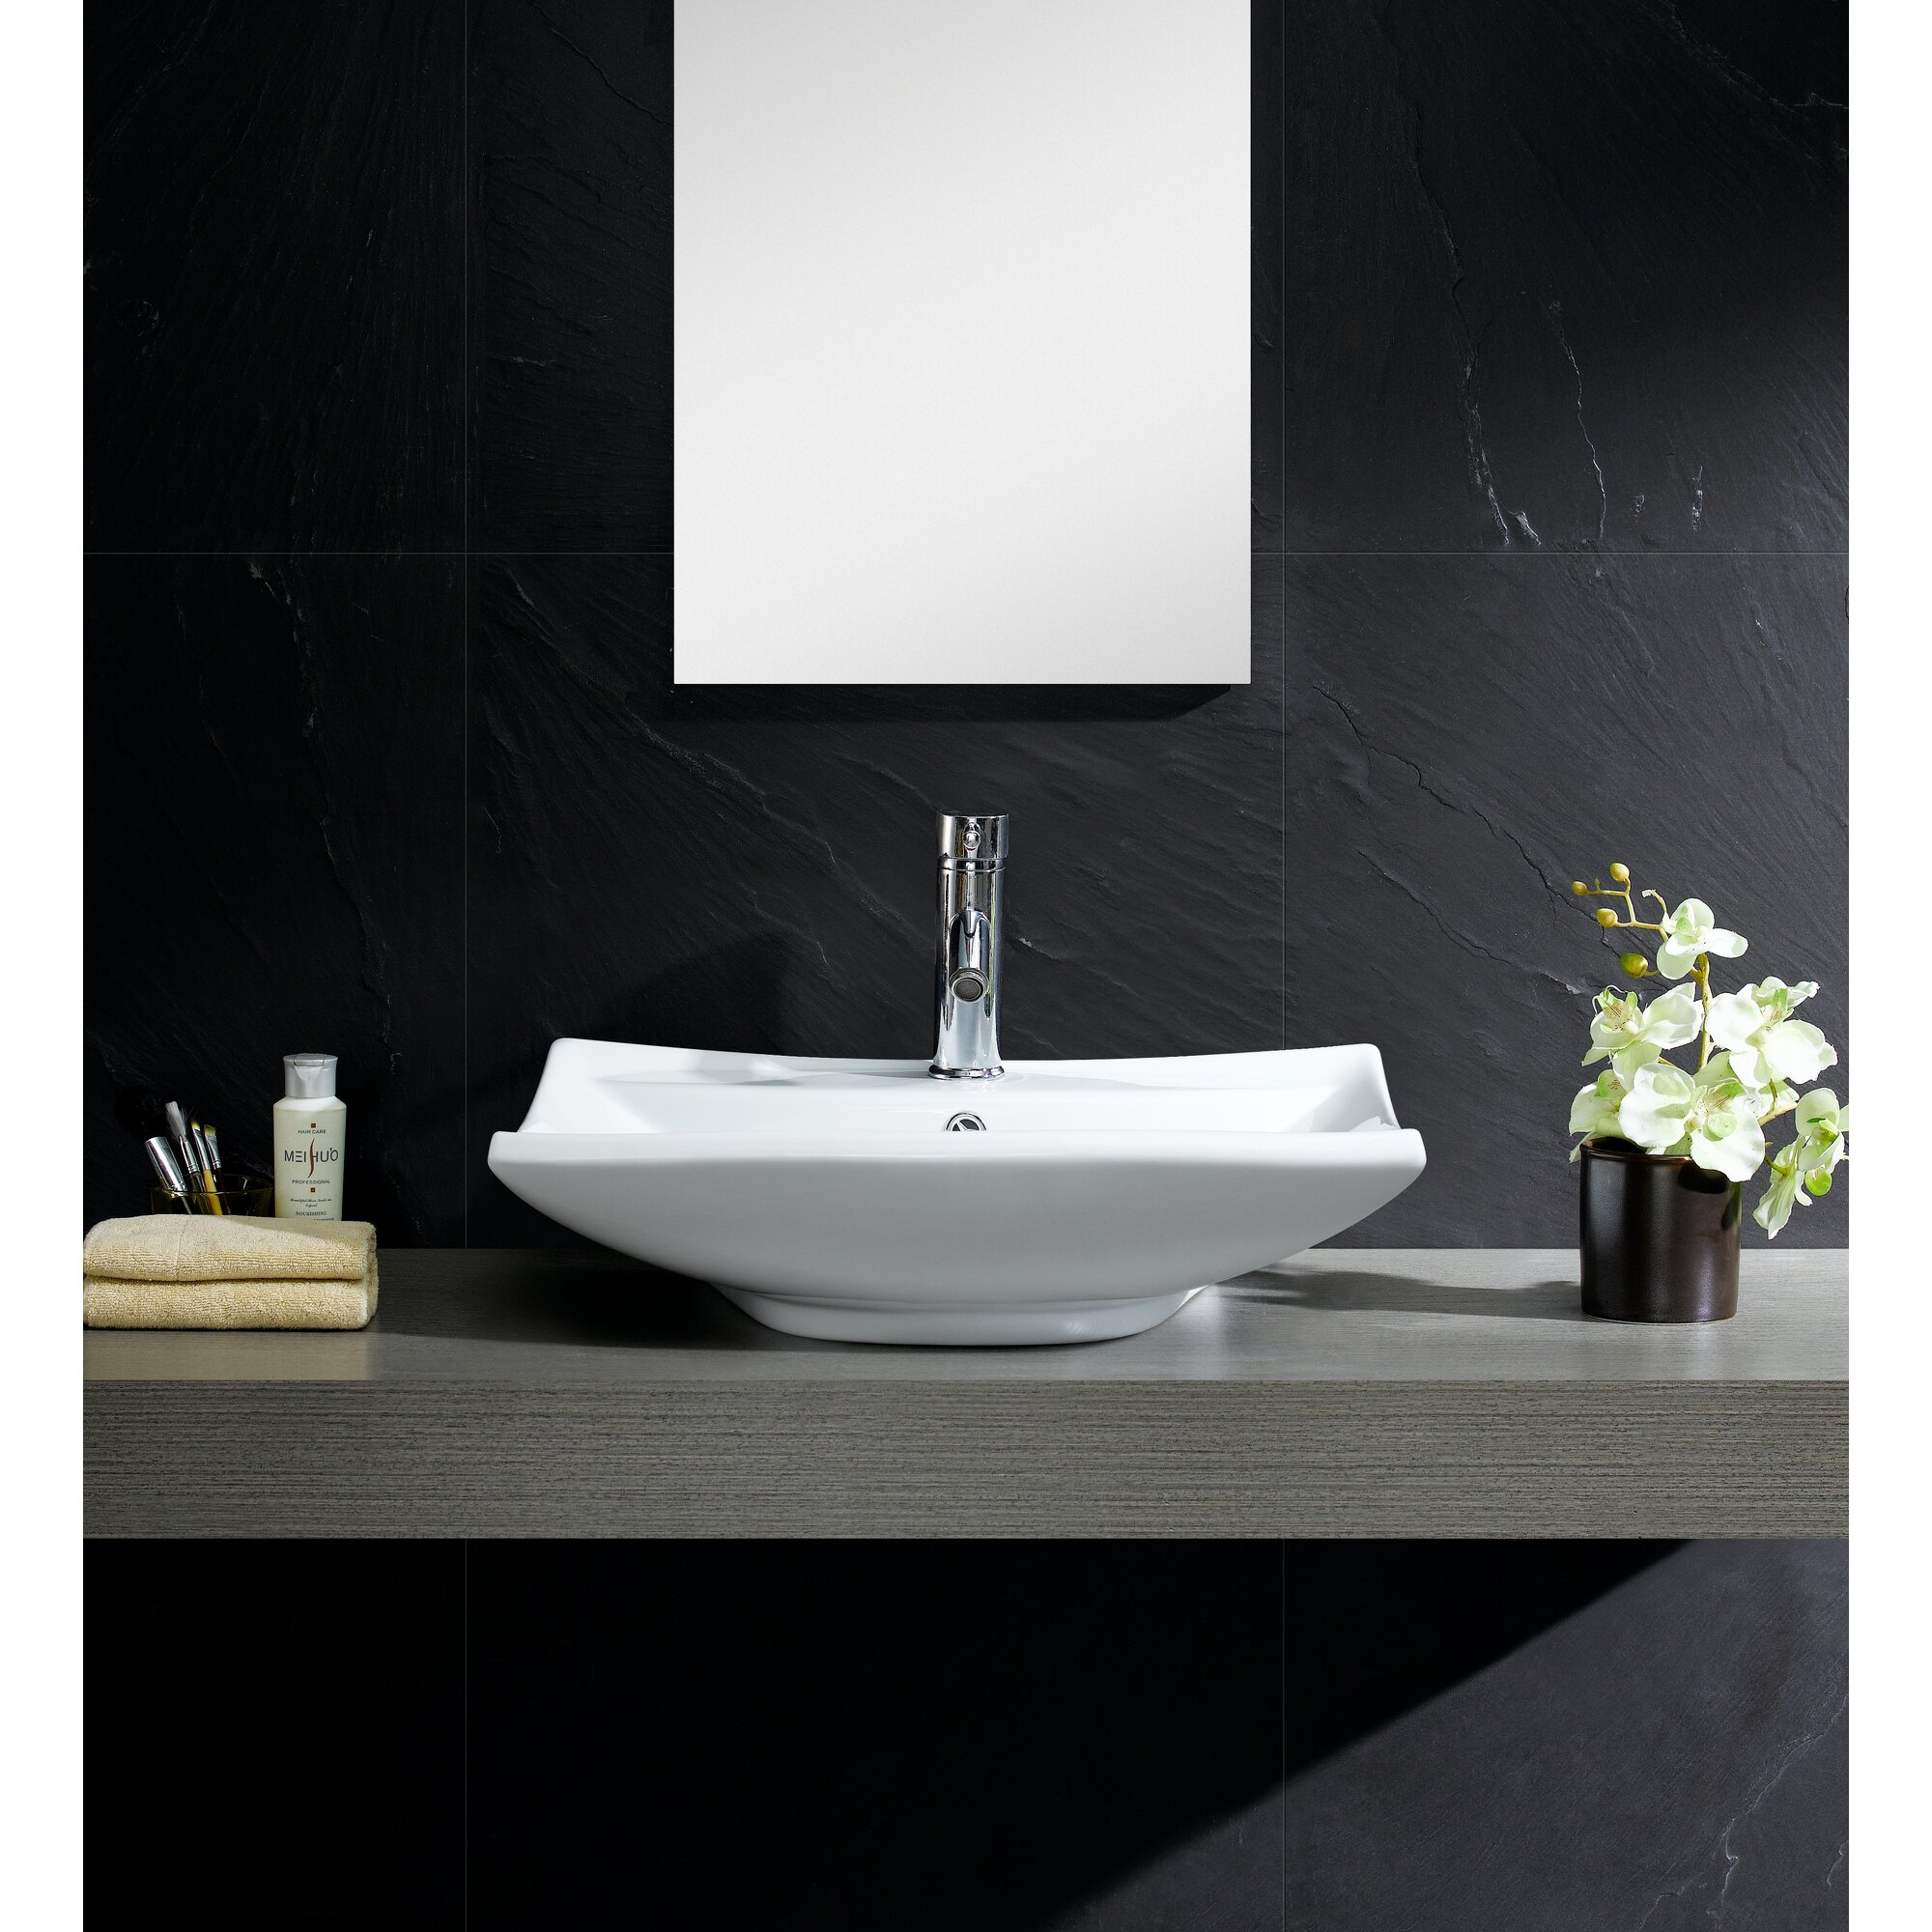 Bathroom square vessel sinks - Modern Vitreous Square Vessel Bathroom Sink With Overflow